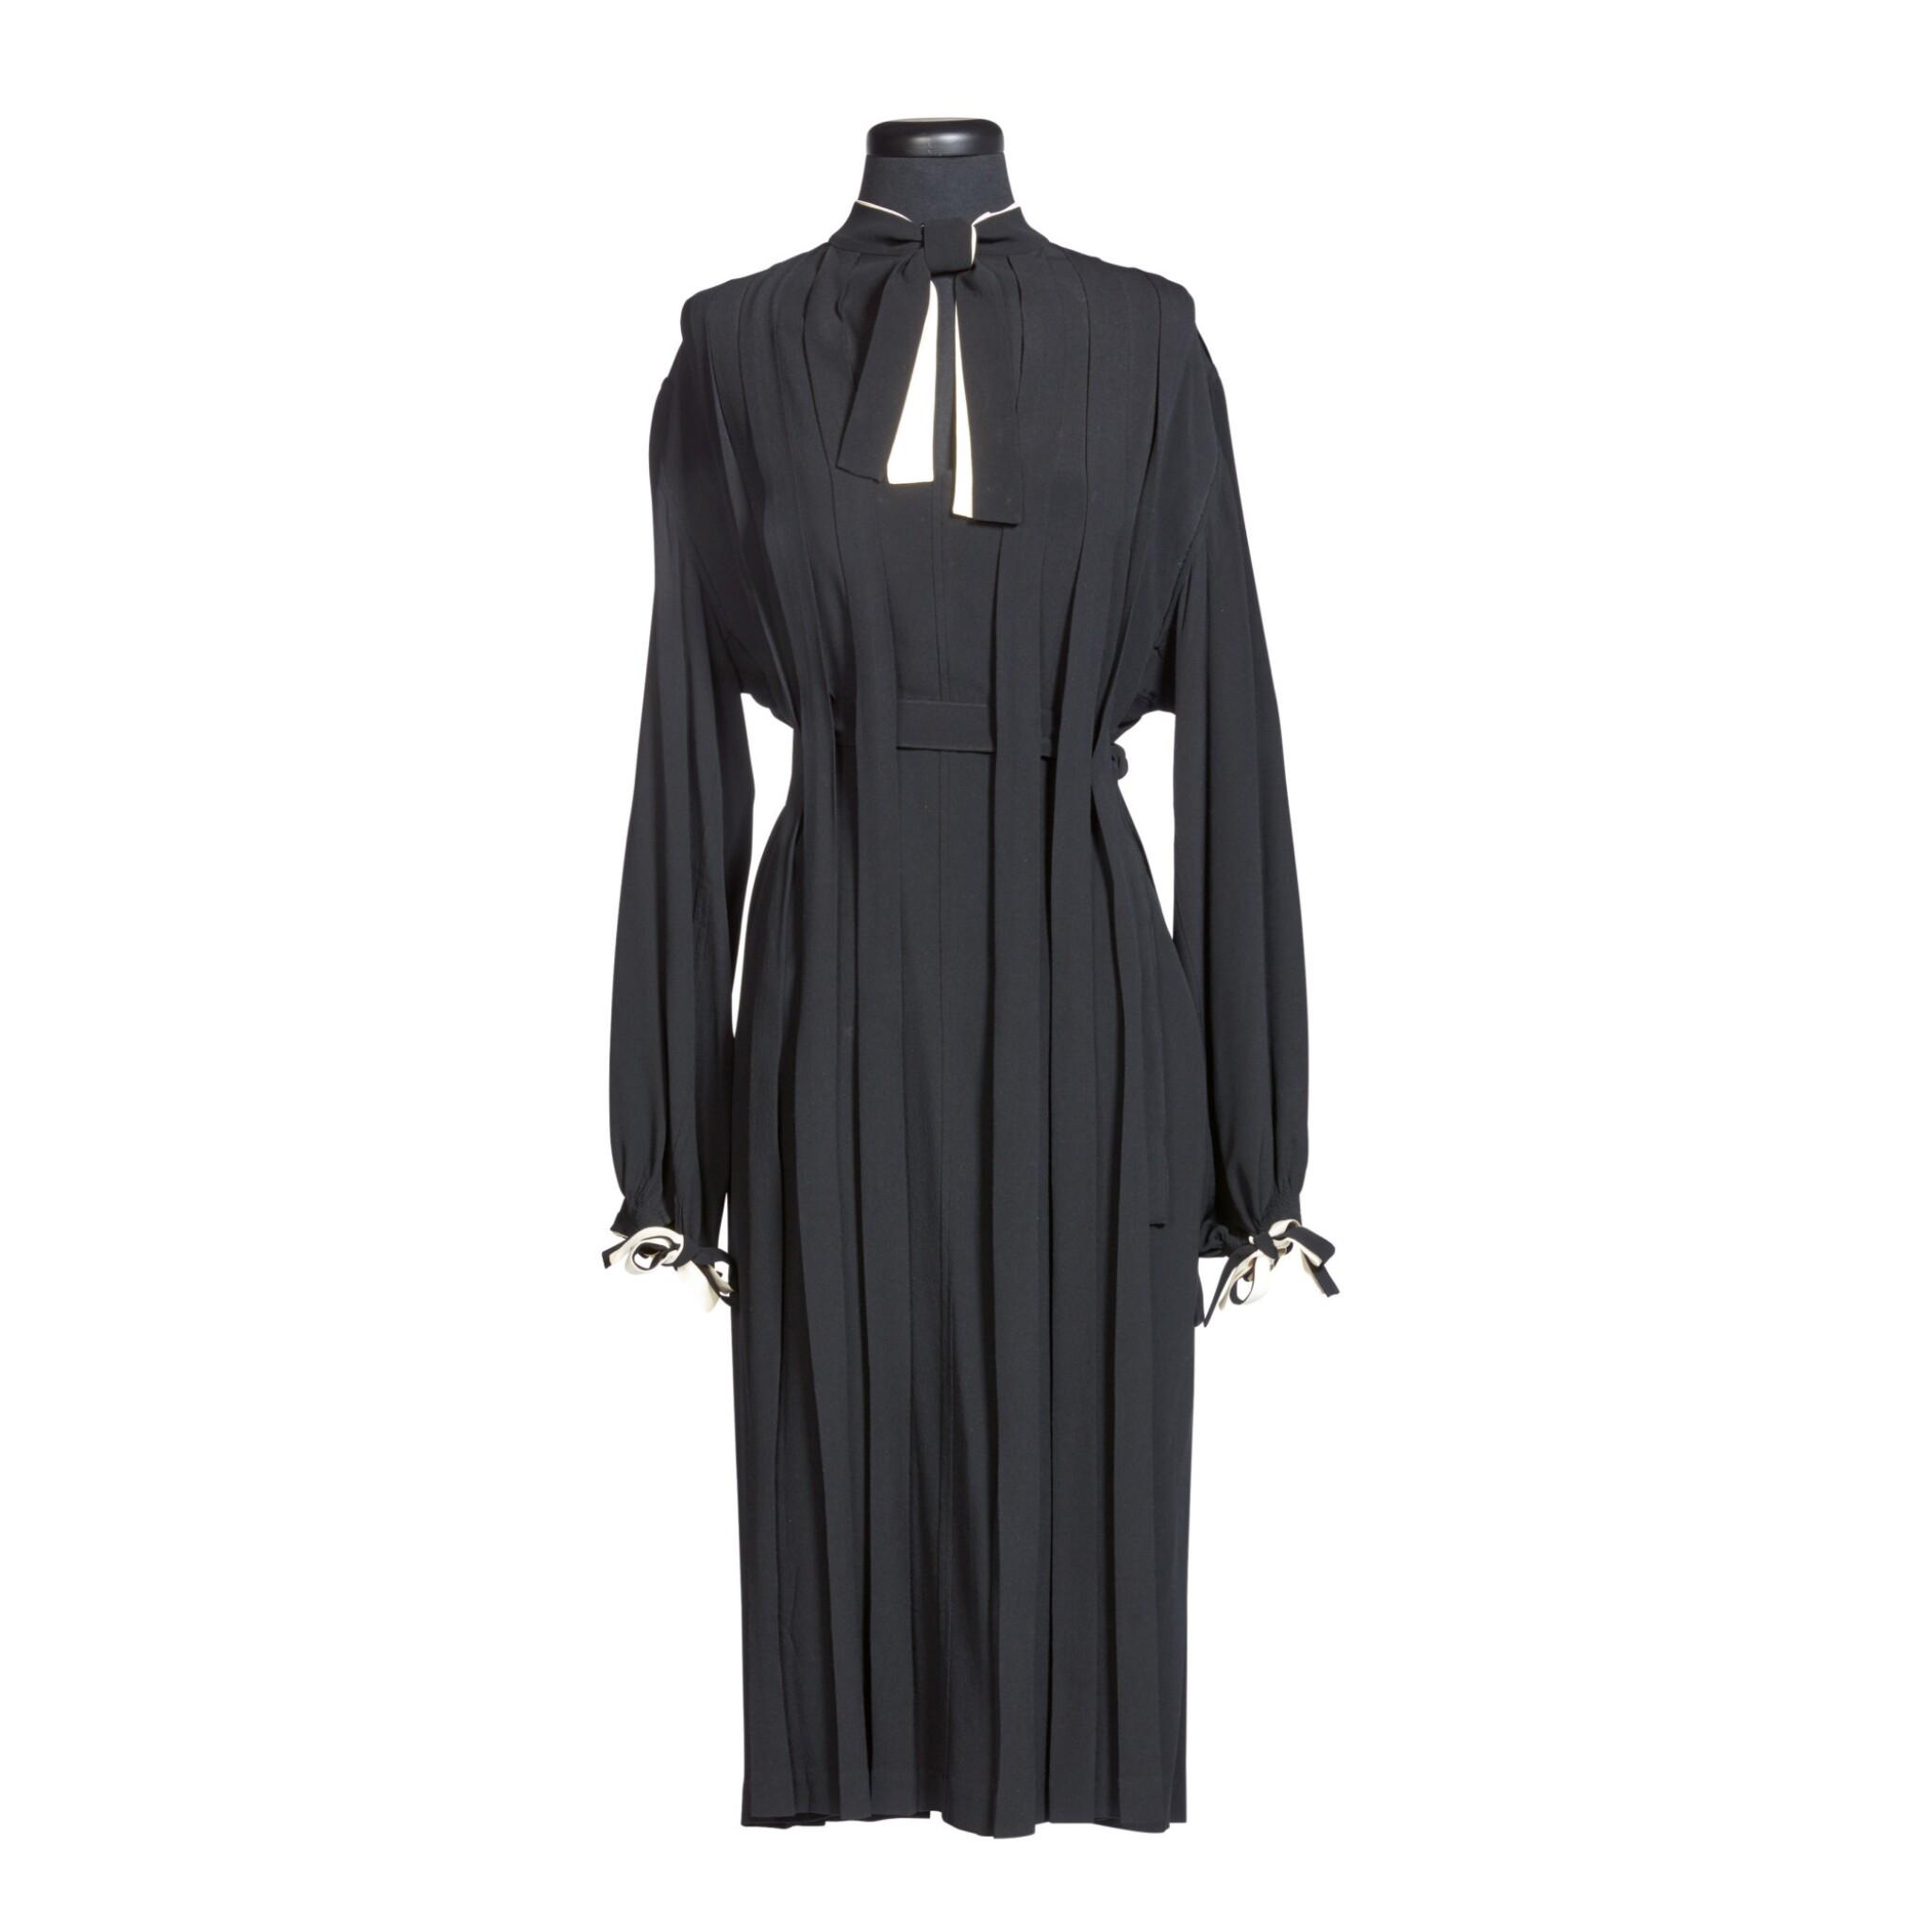 View 1 of Lot 56. GEORGIA O'KEEFFE | CUSTOM BLACK AND WHITE PLEATED DRESS.